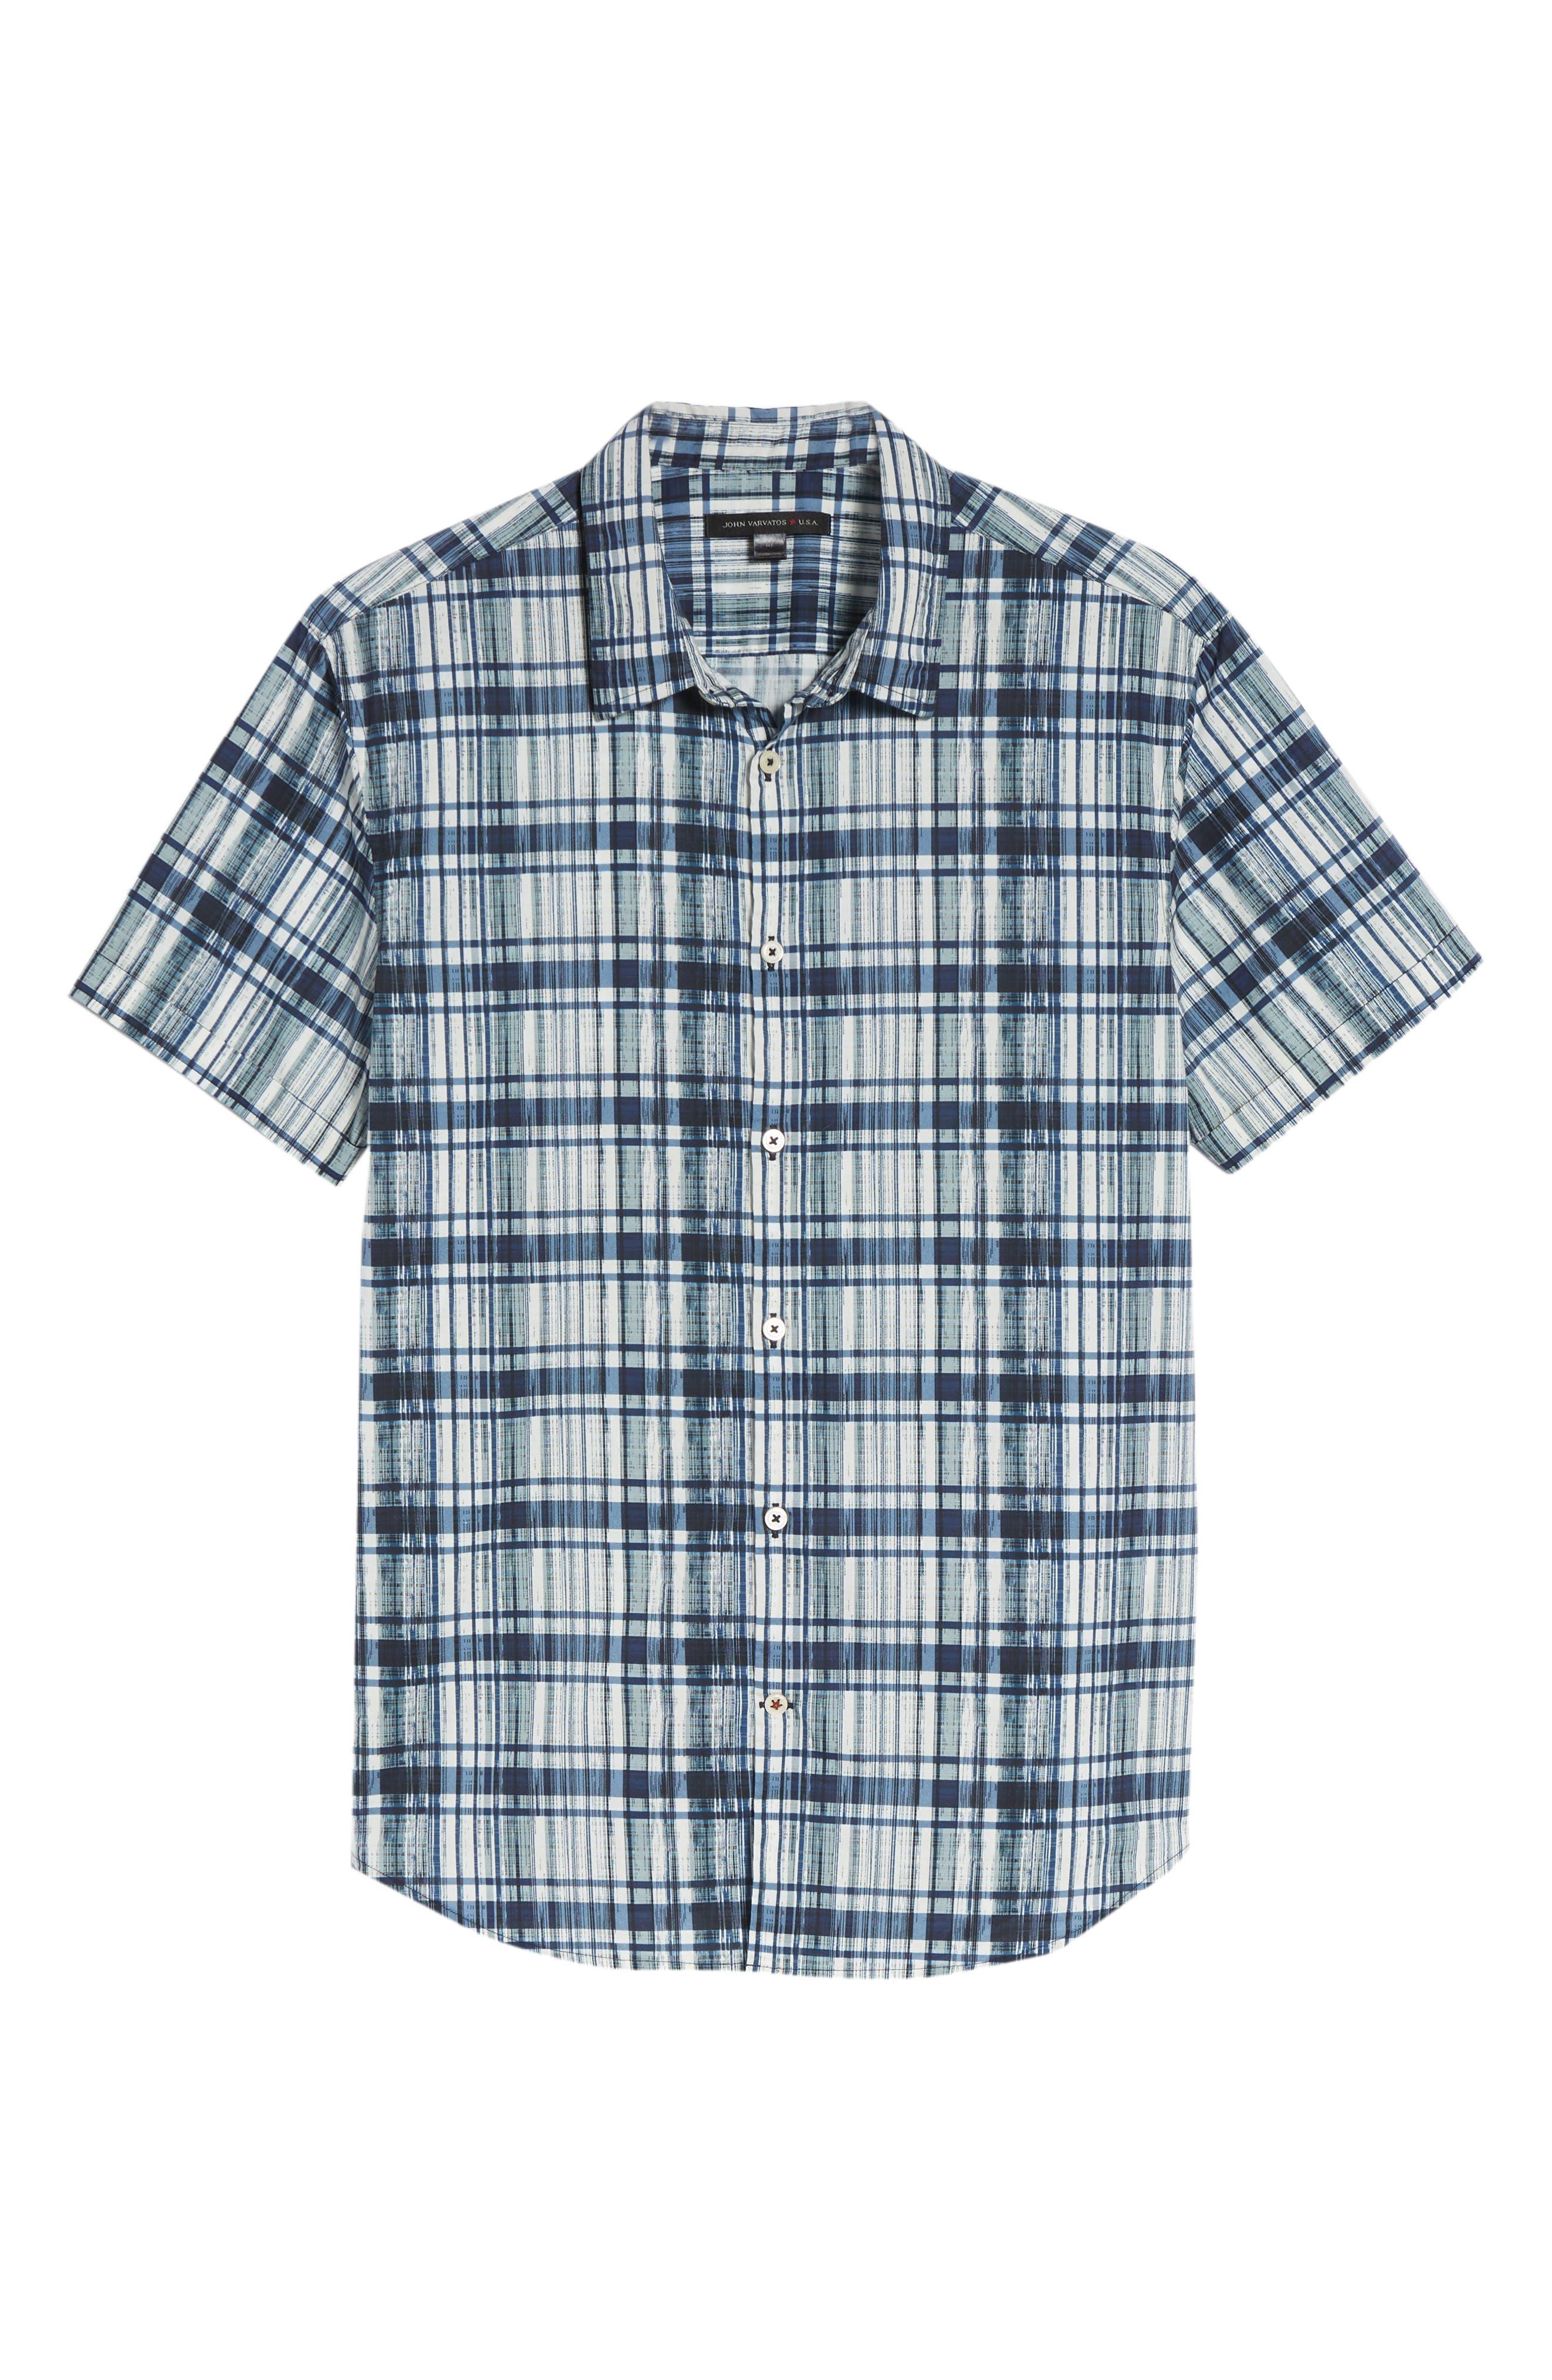 Regular Fit Sport Shirt,                             Alternate thumbnail 6, color,                             417